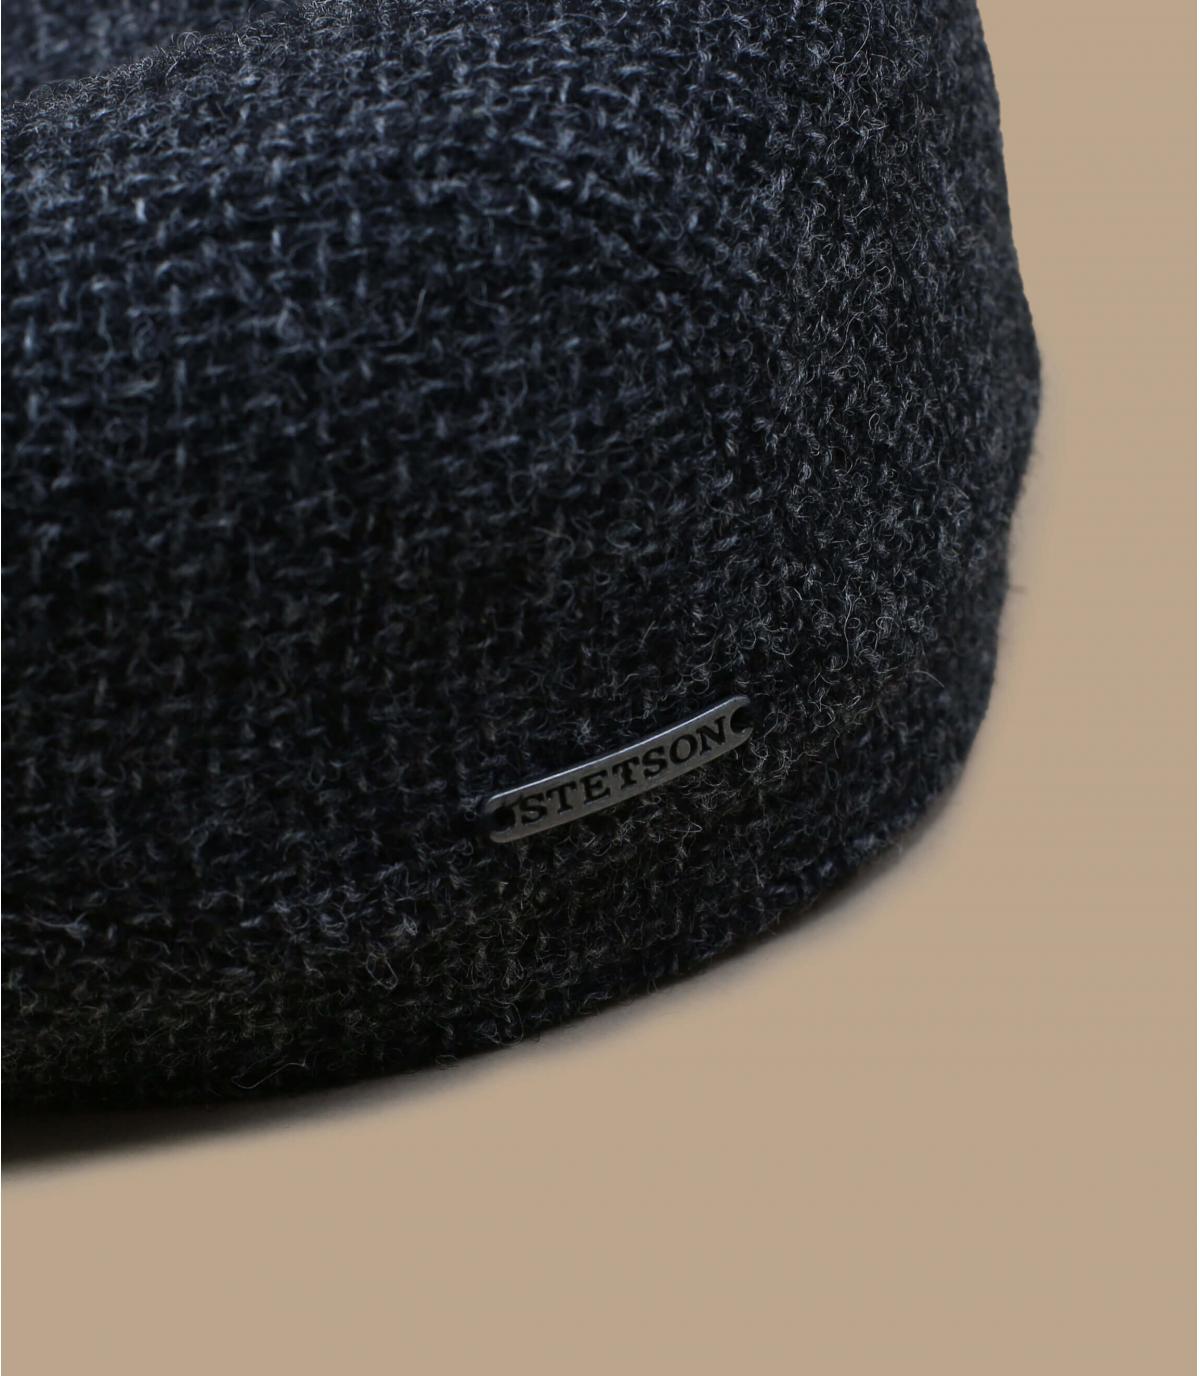 Schiebermütze grau Shetland Wolle